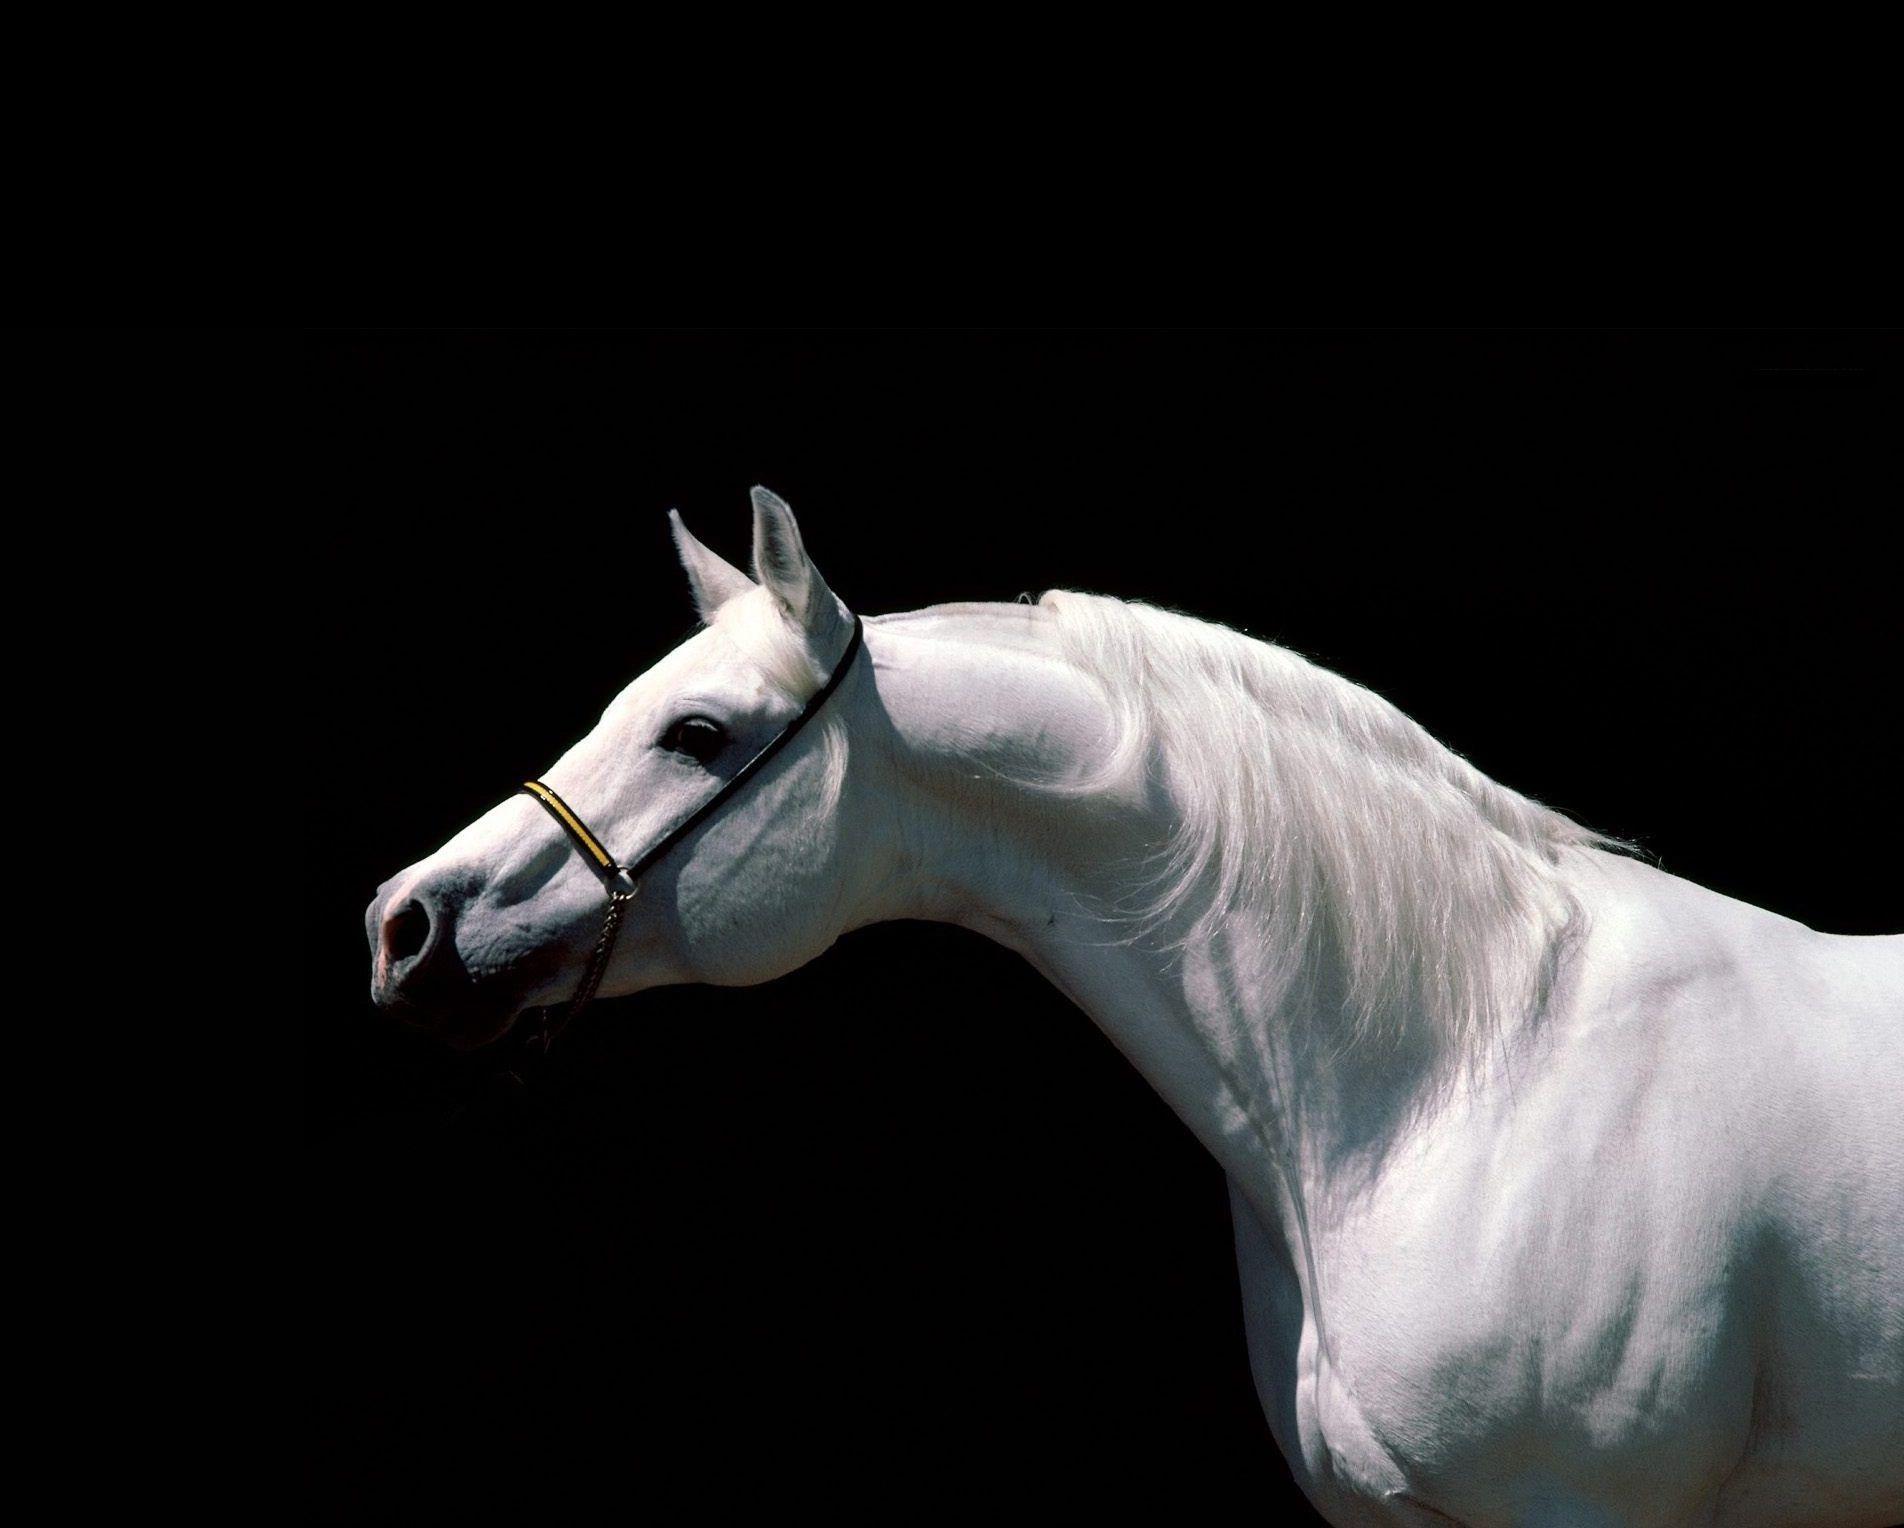 Simple Wallpaper Horse Dual Monitor - 4bd22f5b27f9ac4b81f94699d6e27d84  Trends_128481.jpg